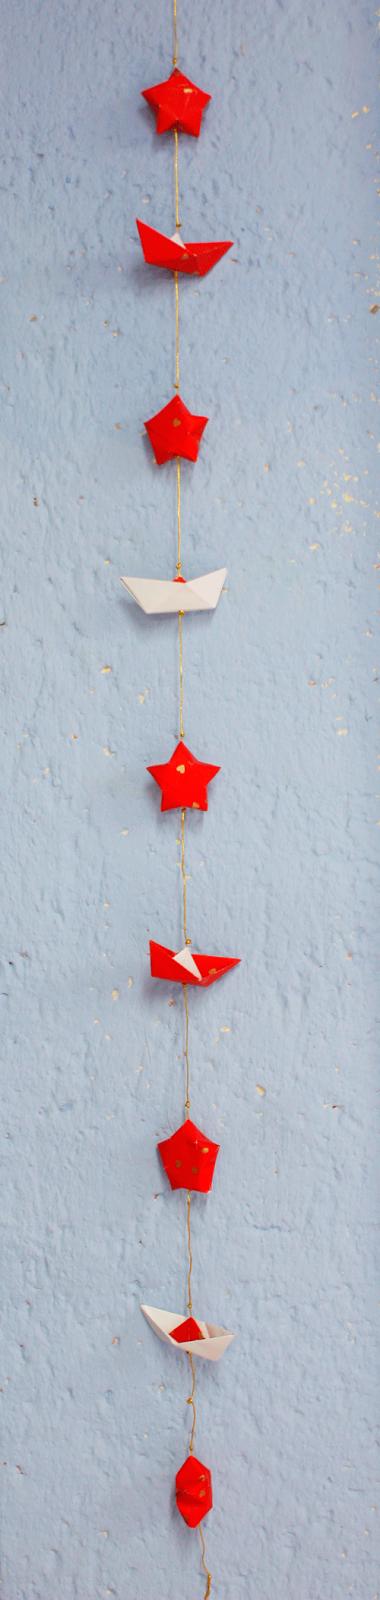 Pintalalluna adornos navide os guirnalda de origami for Adornos navidenos origami paso a paso